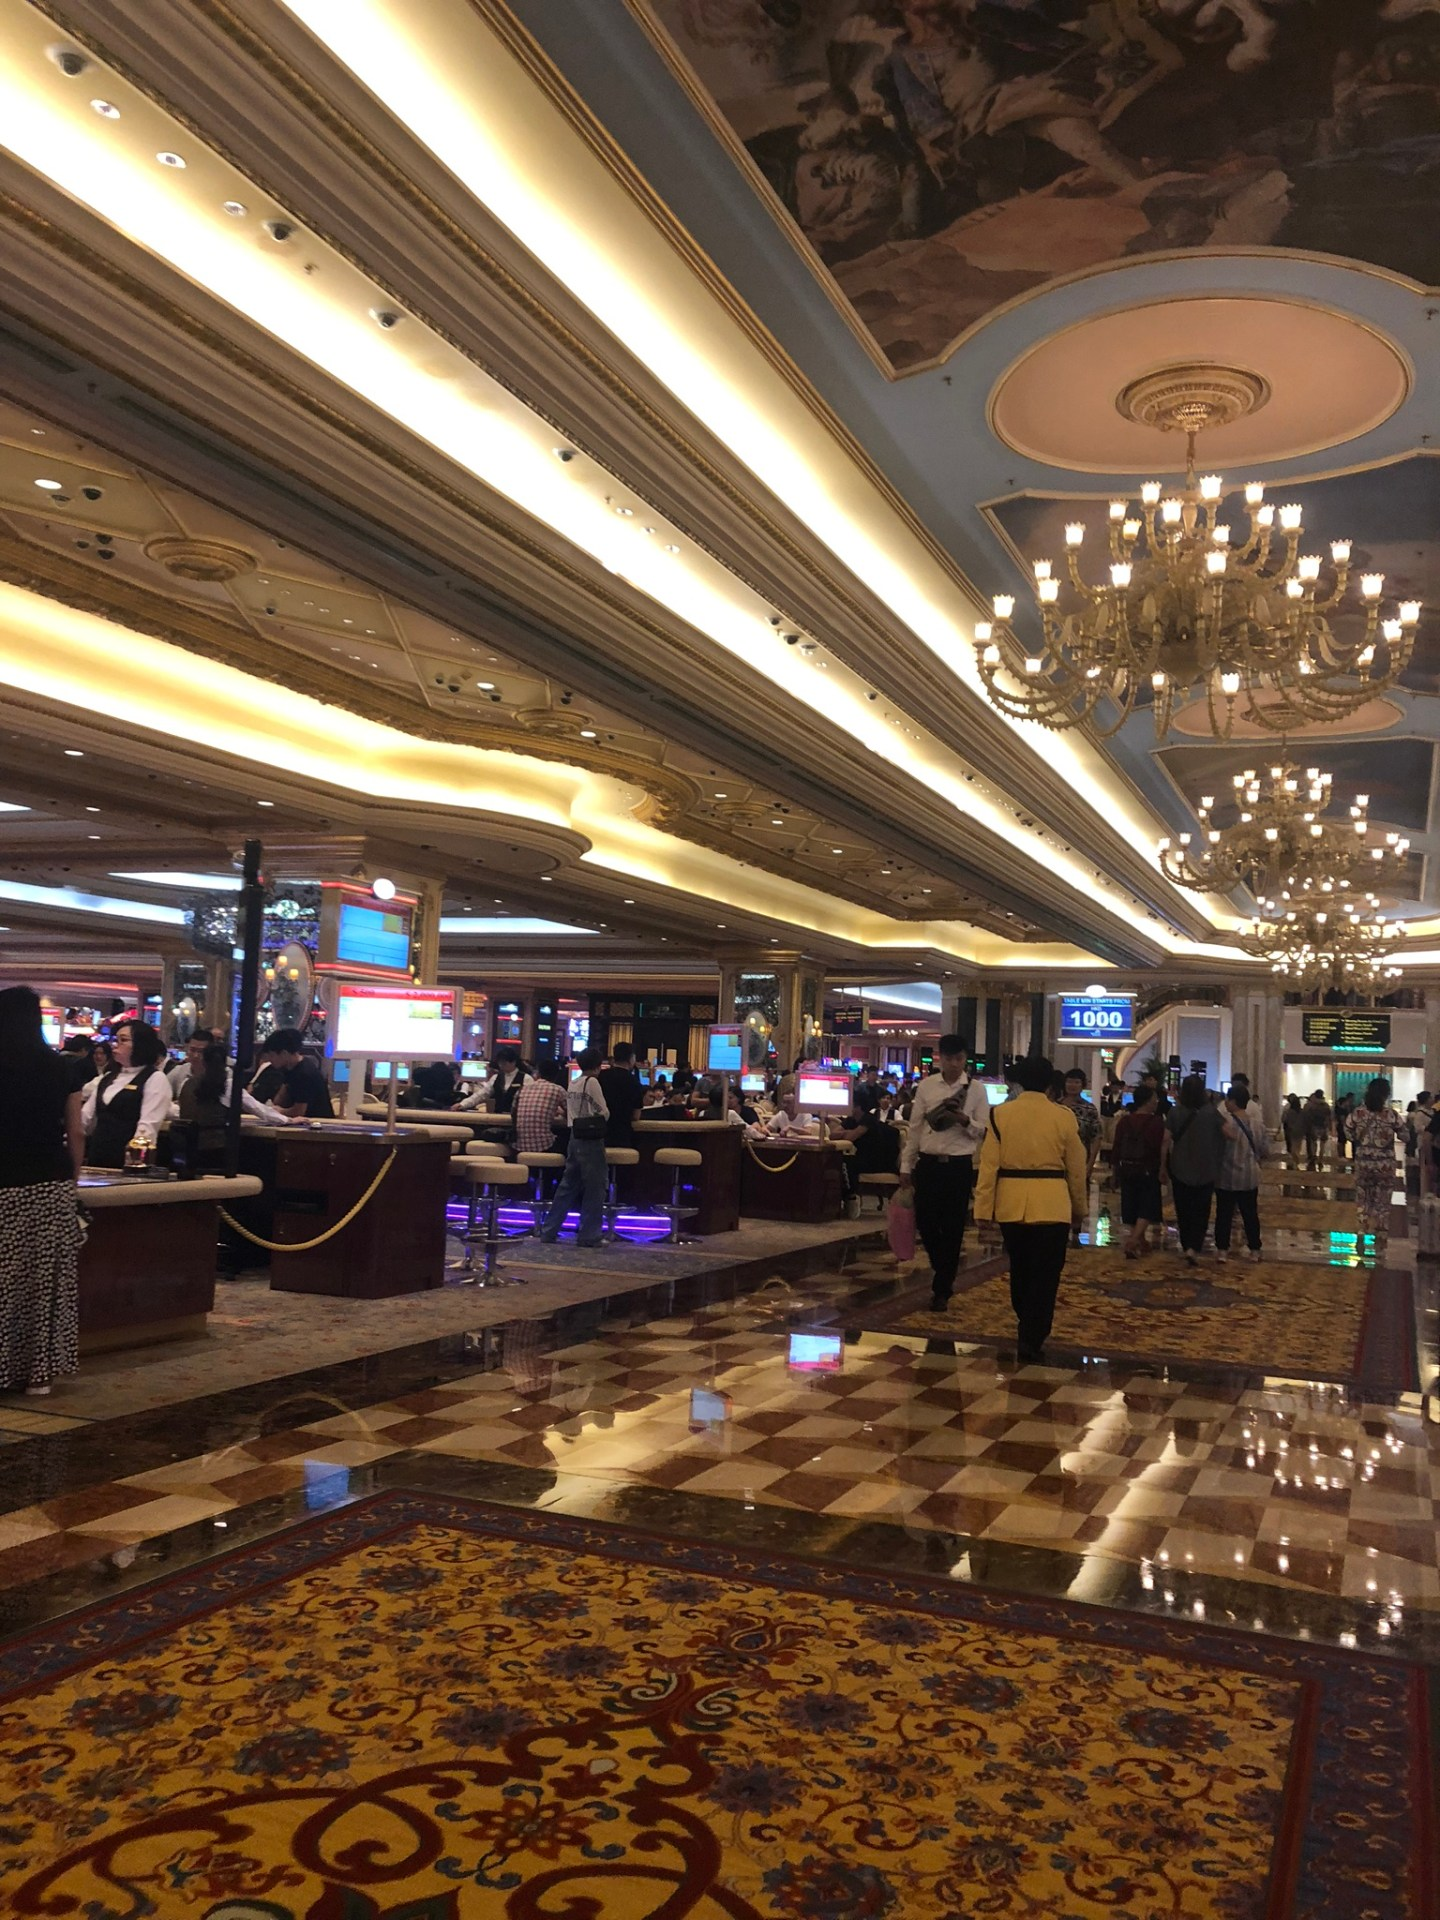 The Venetian, Macau casino on the Cotai Strip